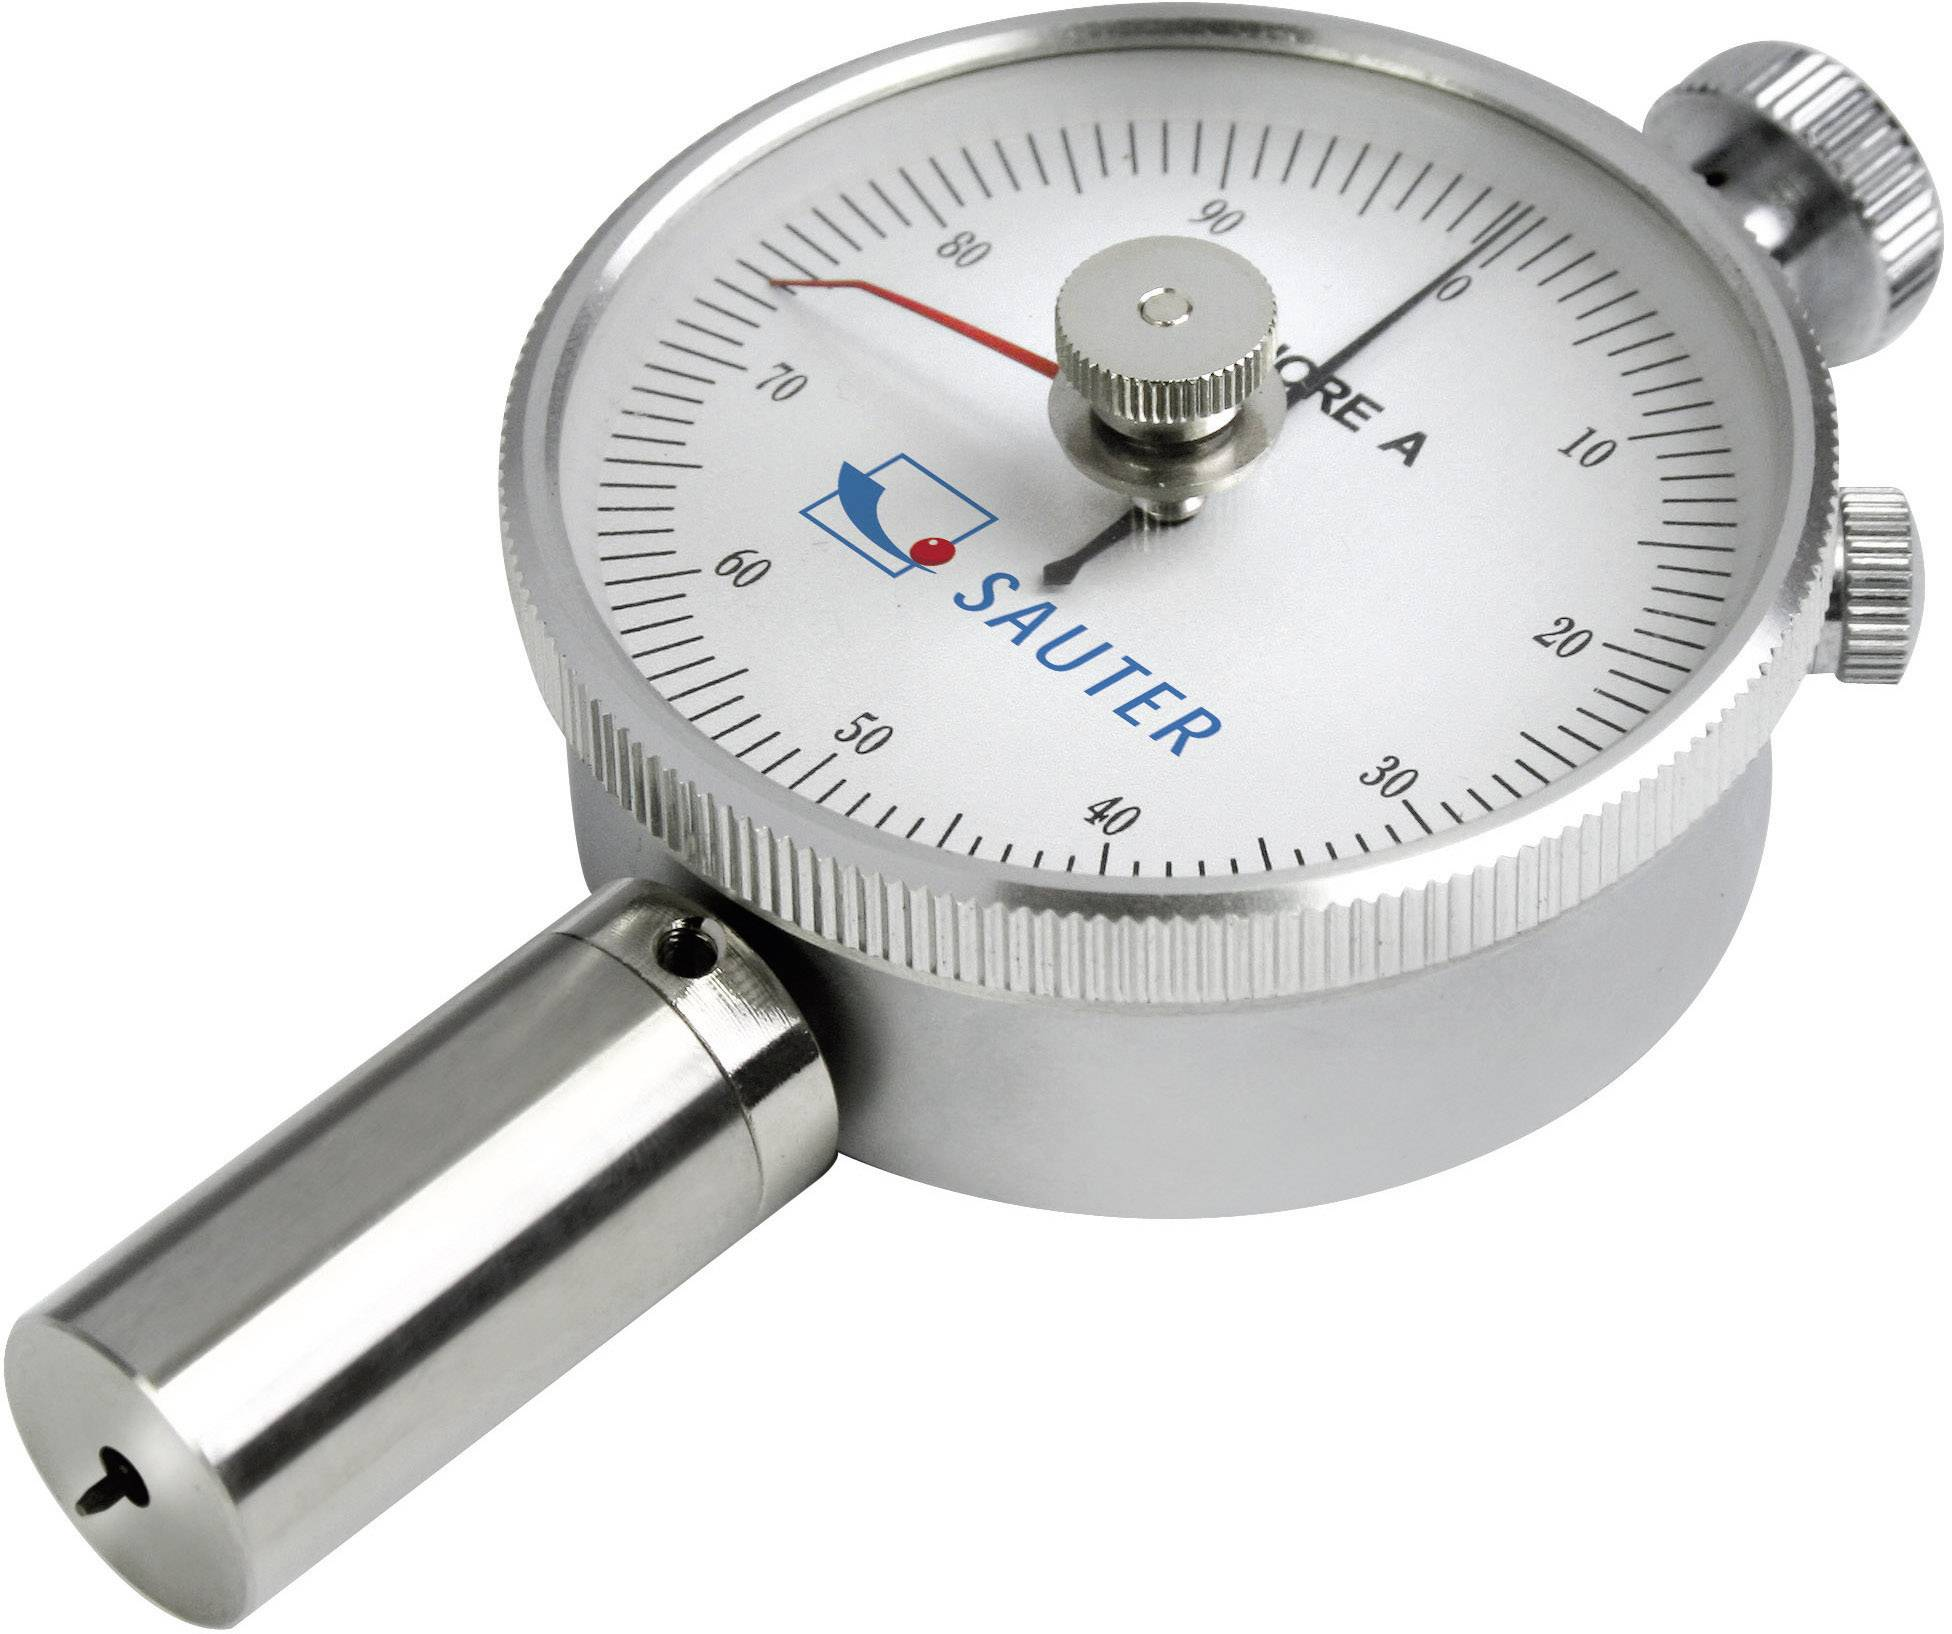 Merač tvrdosti materiálov Sauter HBD 100-0